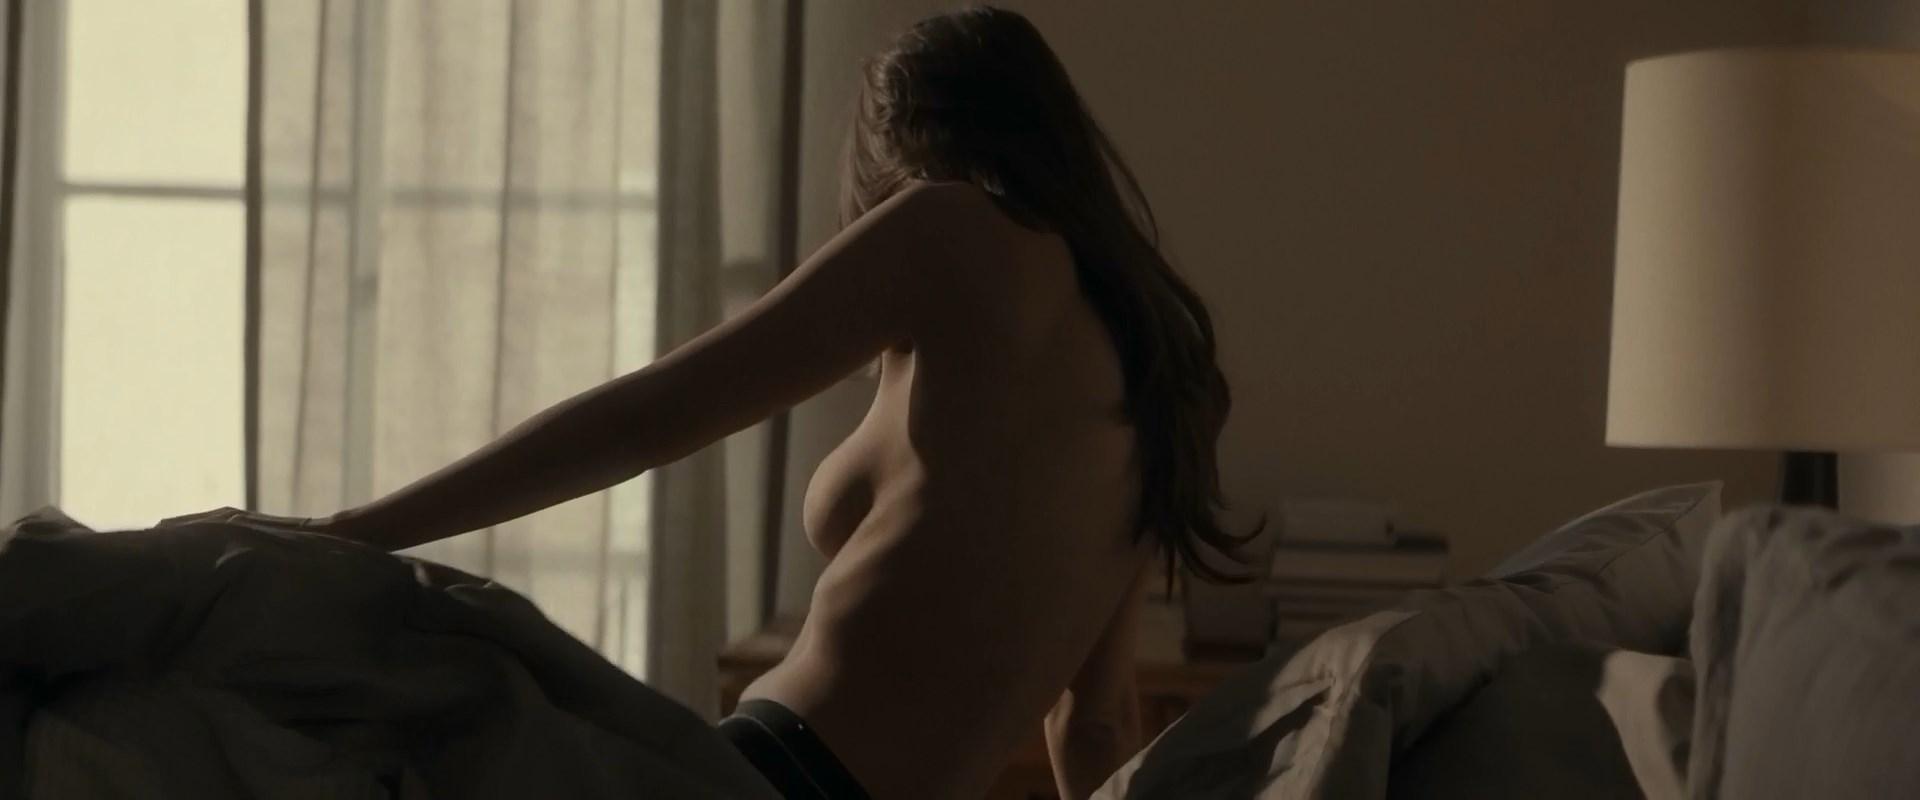 amy reid porn video